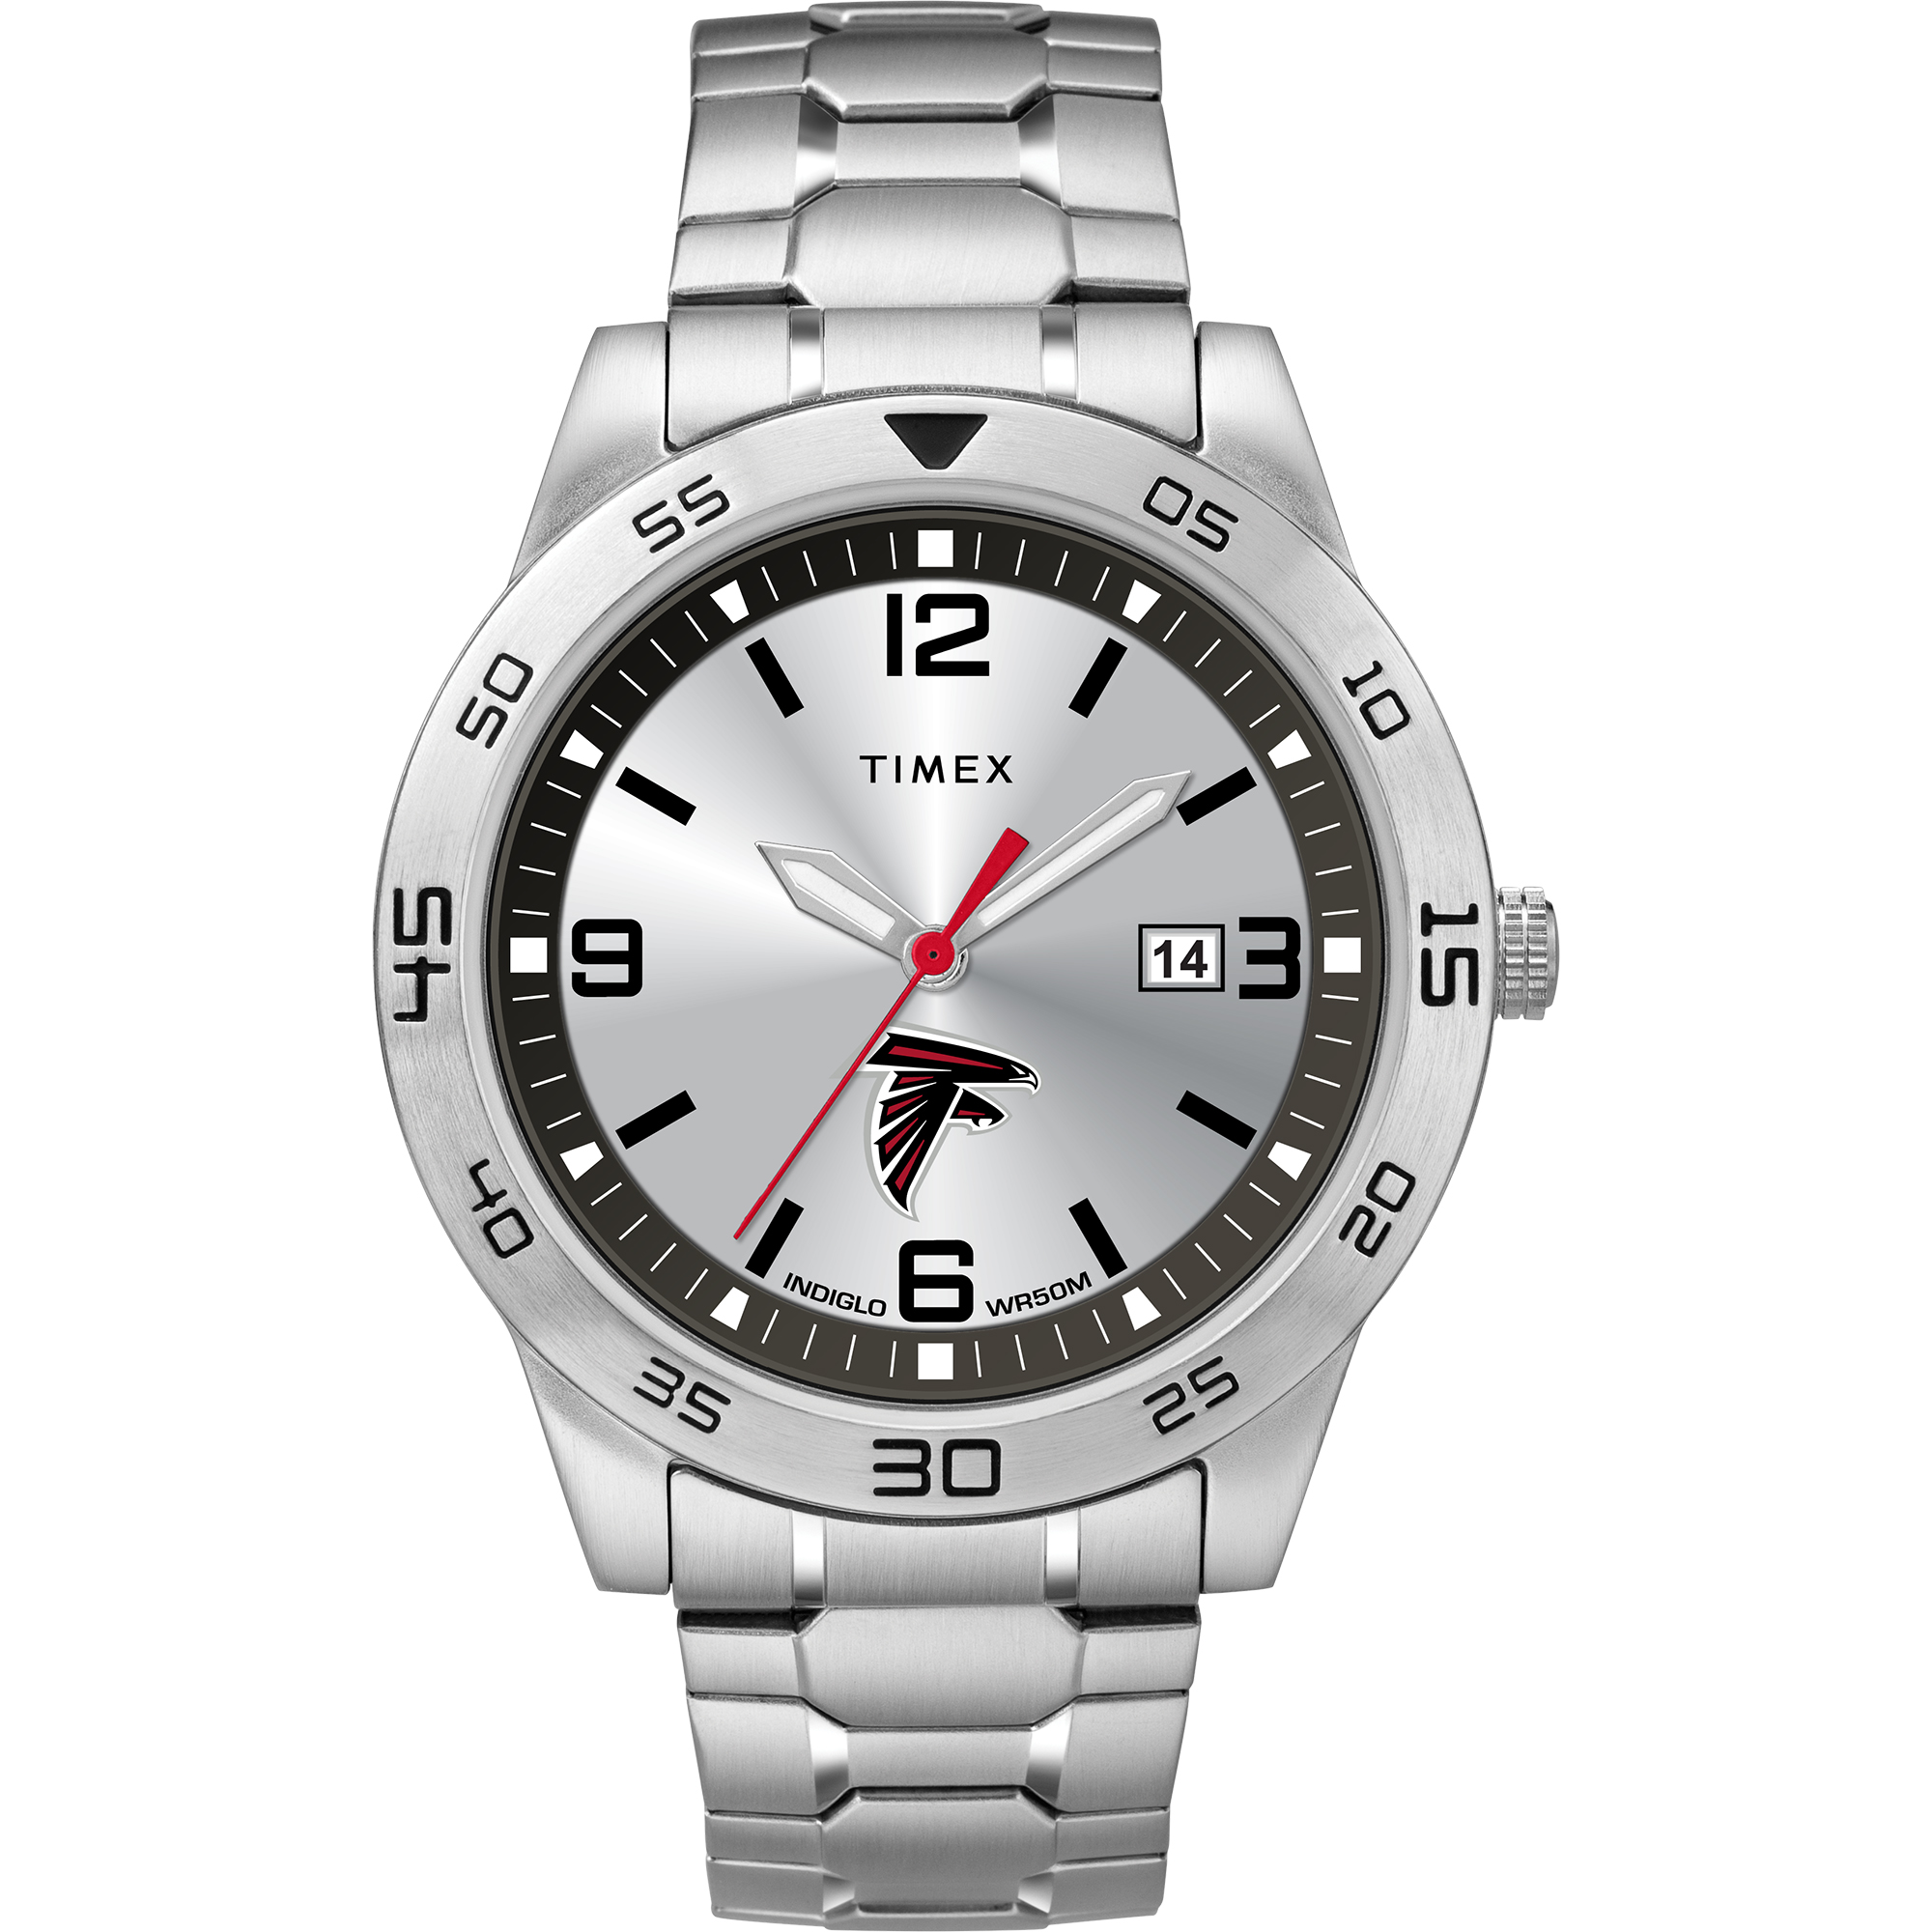 Timex - NFL Tribute Collection Citation Men's Watch, Atlanta Falcons